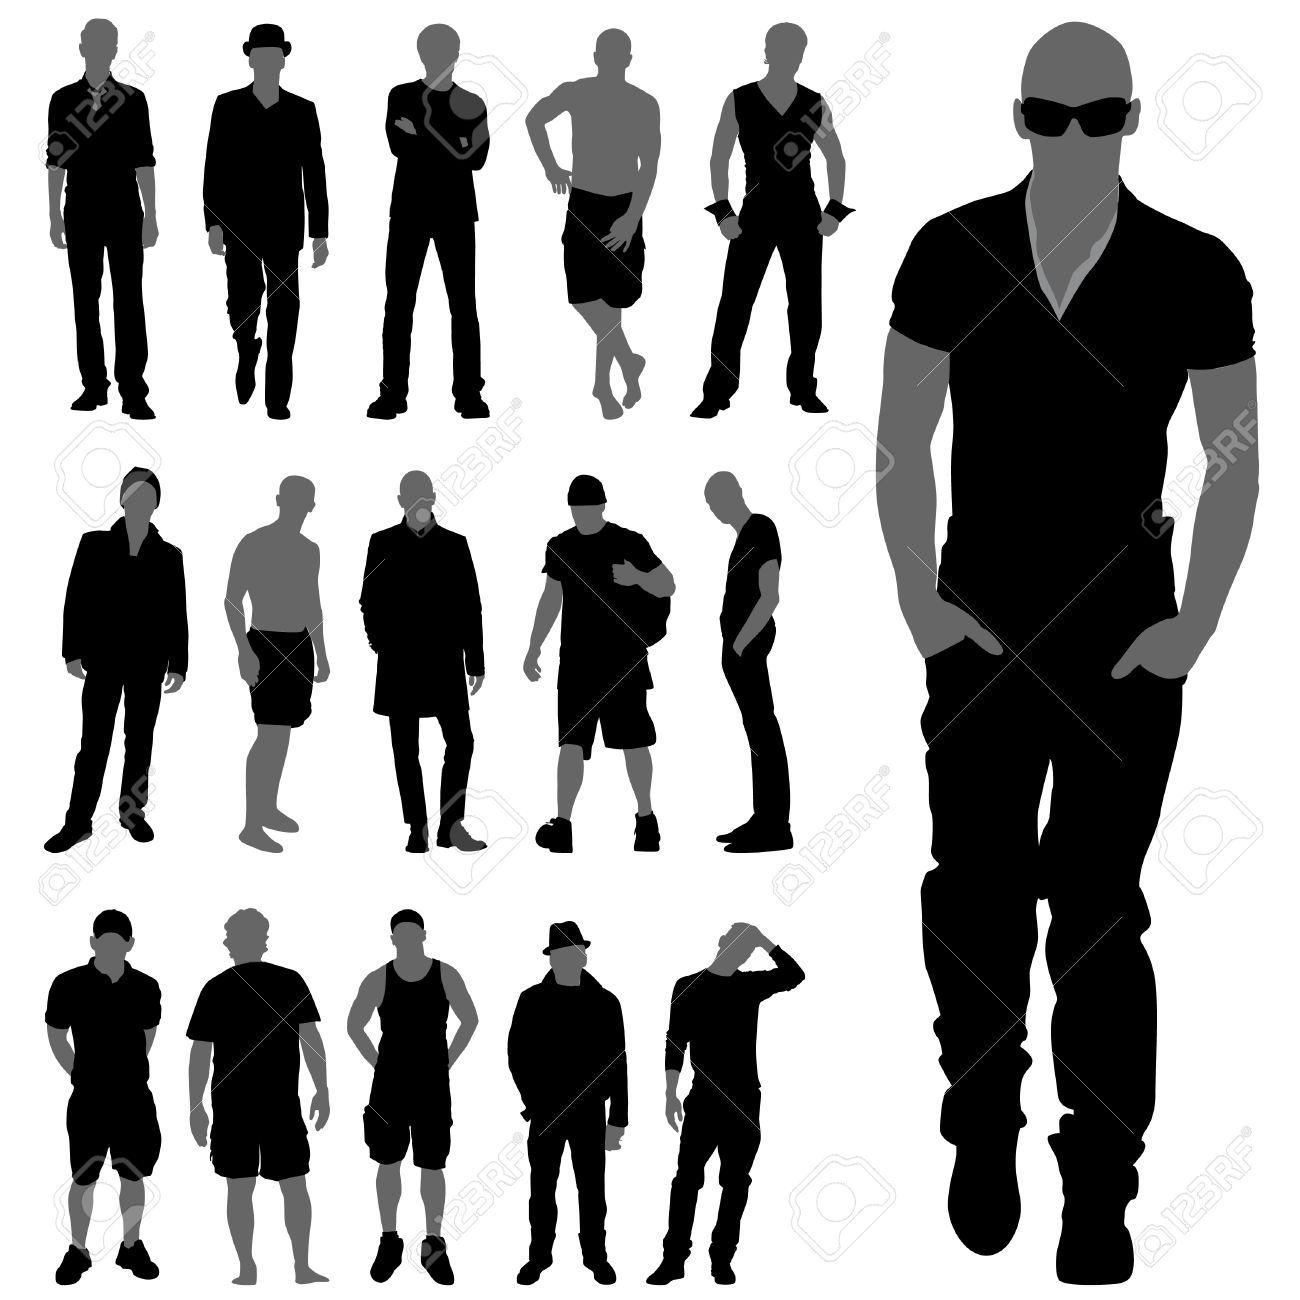 e35e14f5bfb Fashion man silhouettes royalty free cliparts vectors and stock jpg  1300x1300 Man silhouette fashion